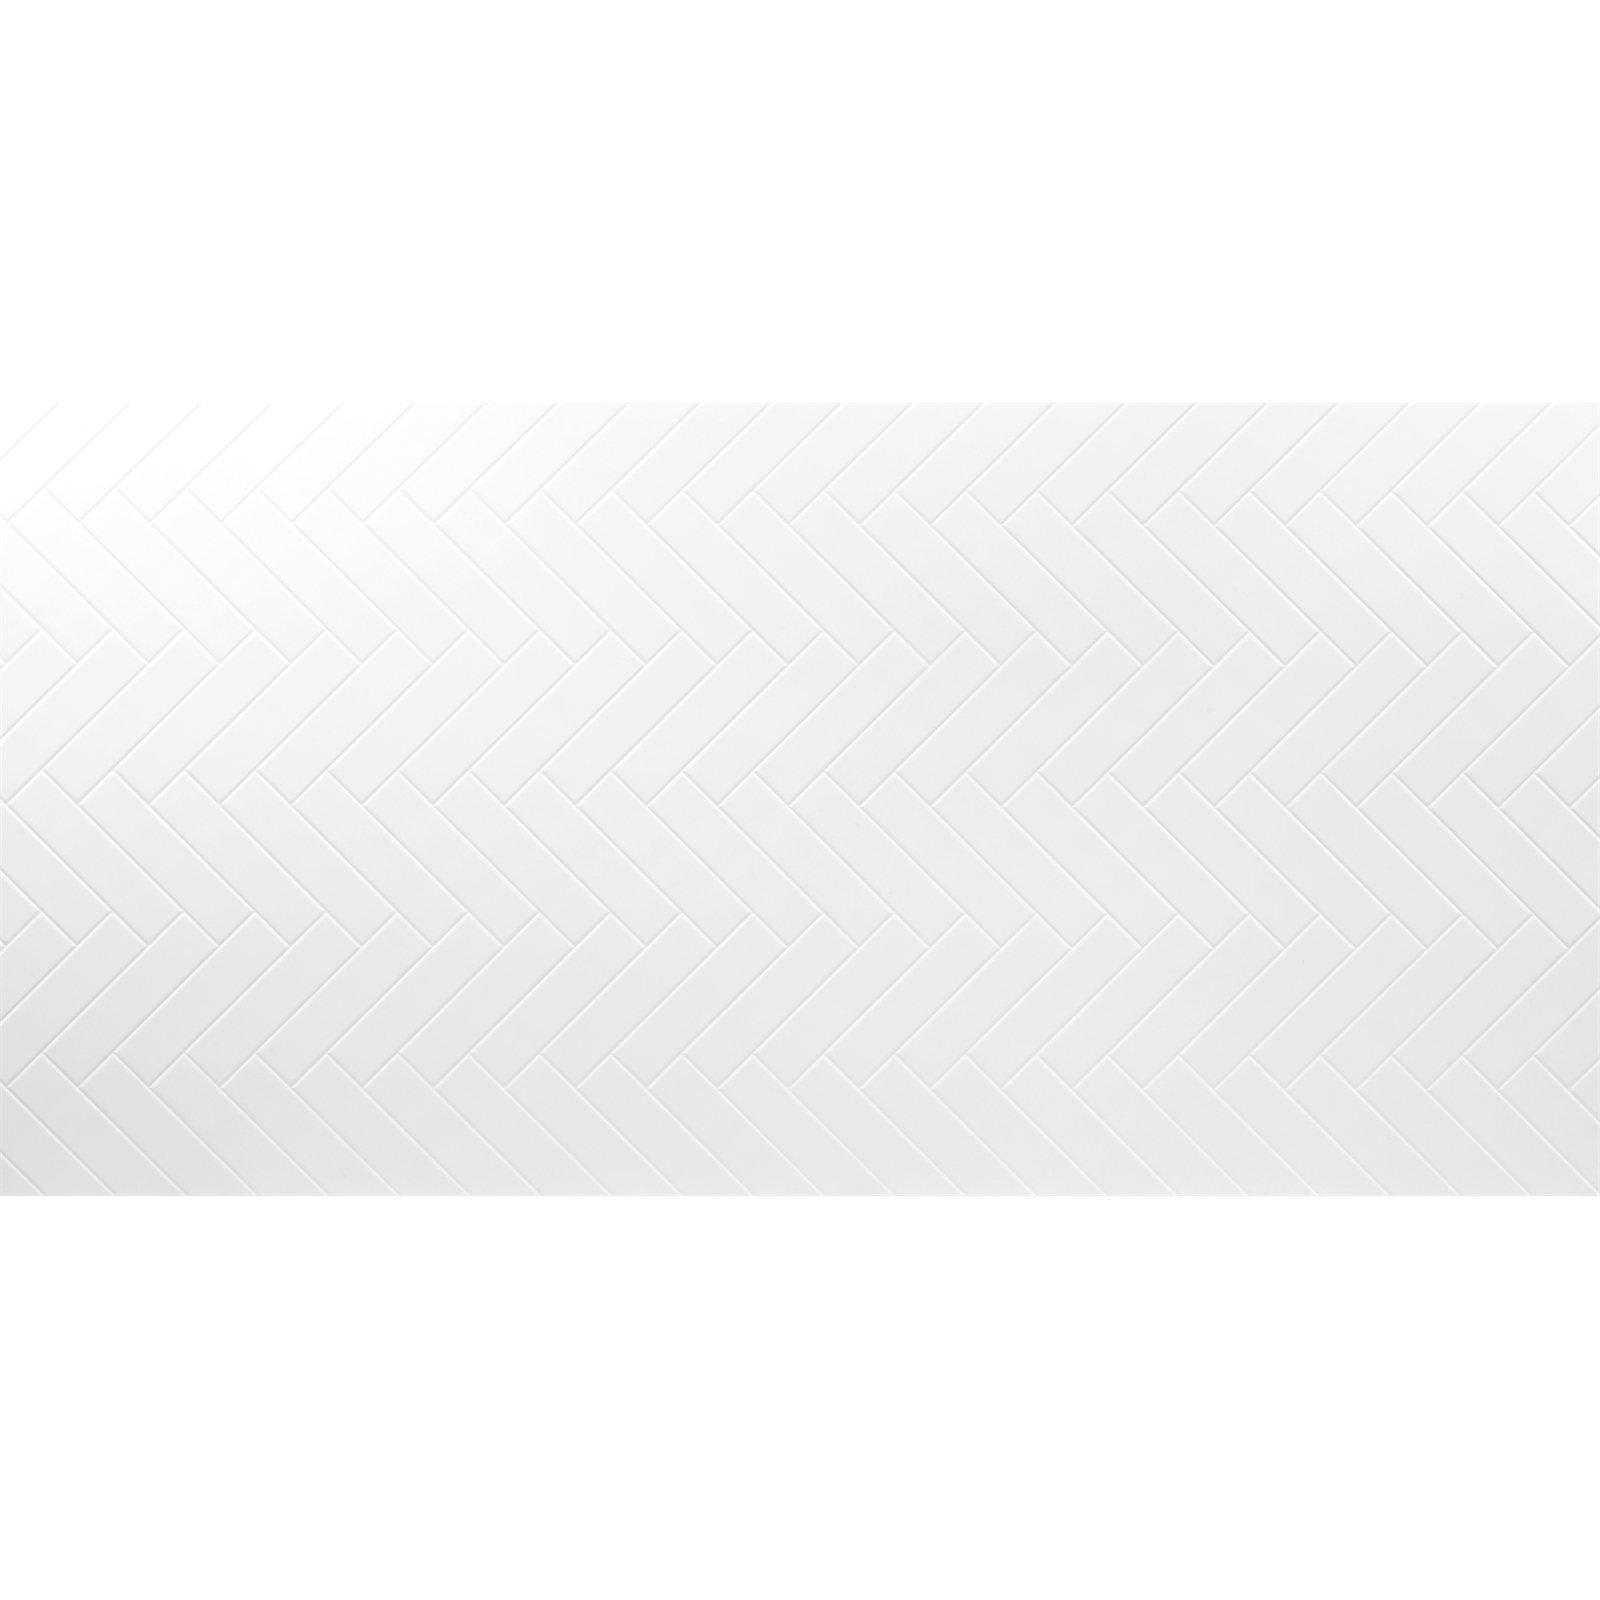 Seratone 2400 x 1200 x 4.5mm Polar White Aqua Herringbone Tile